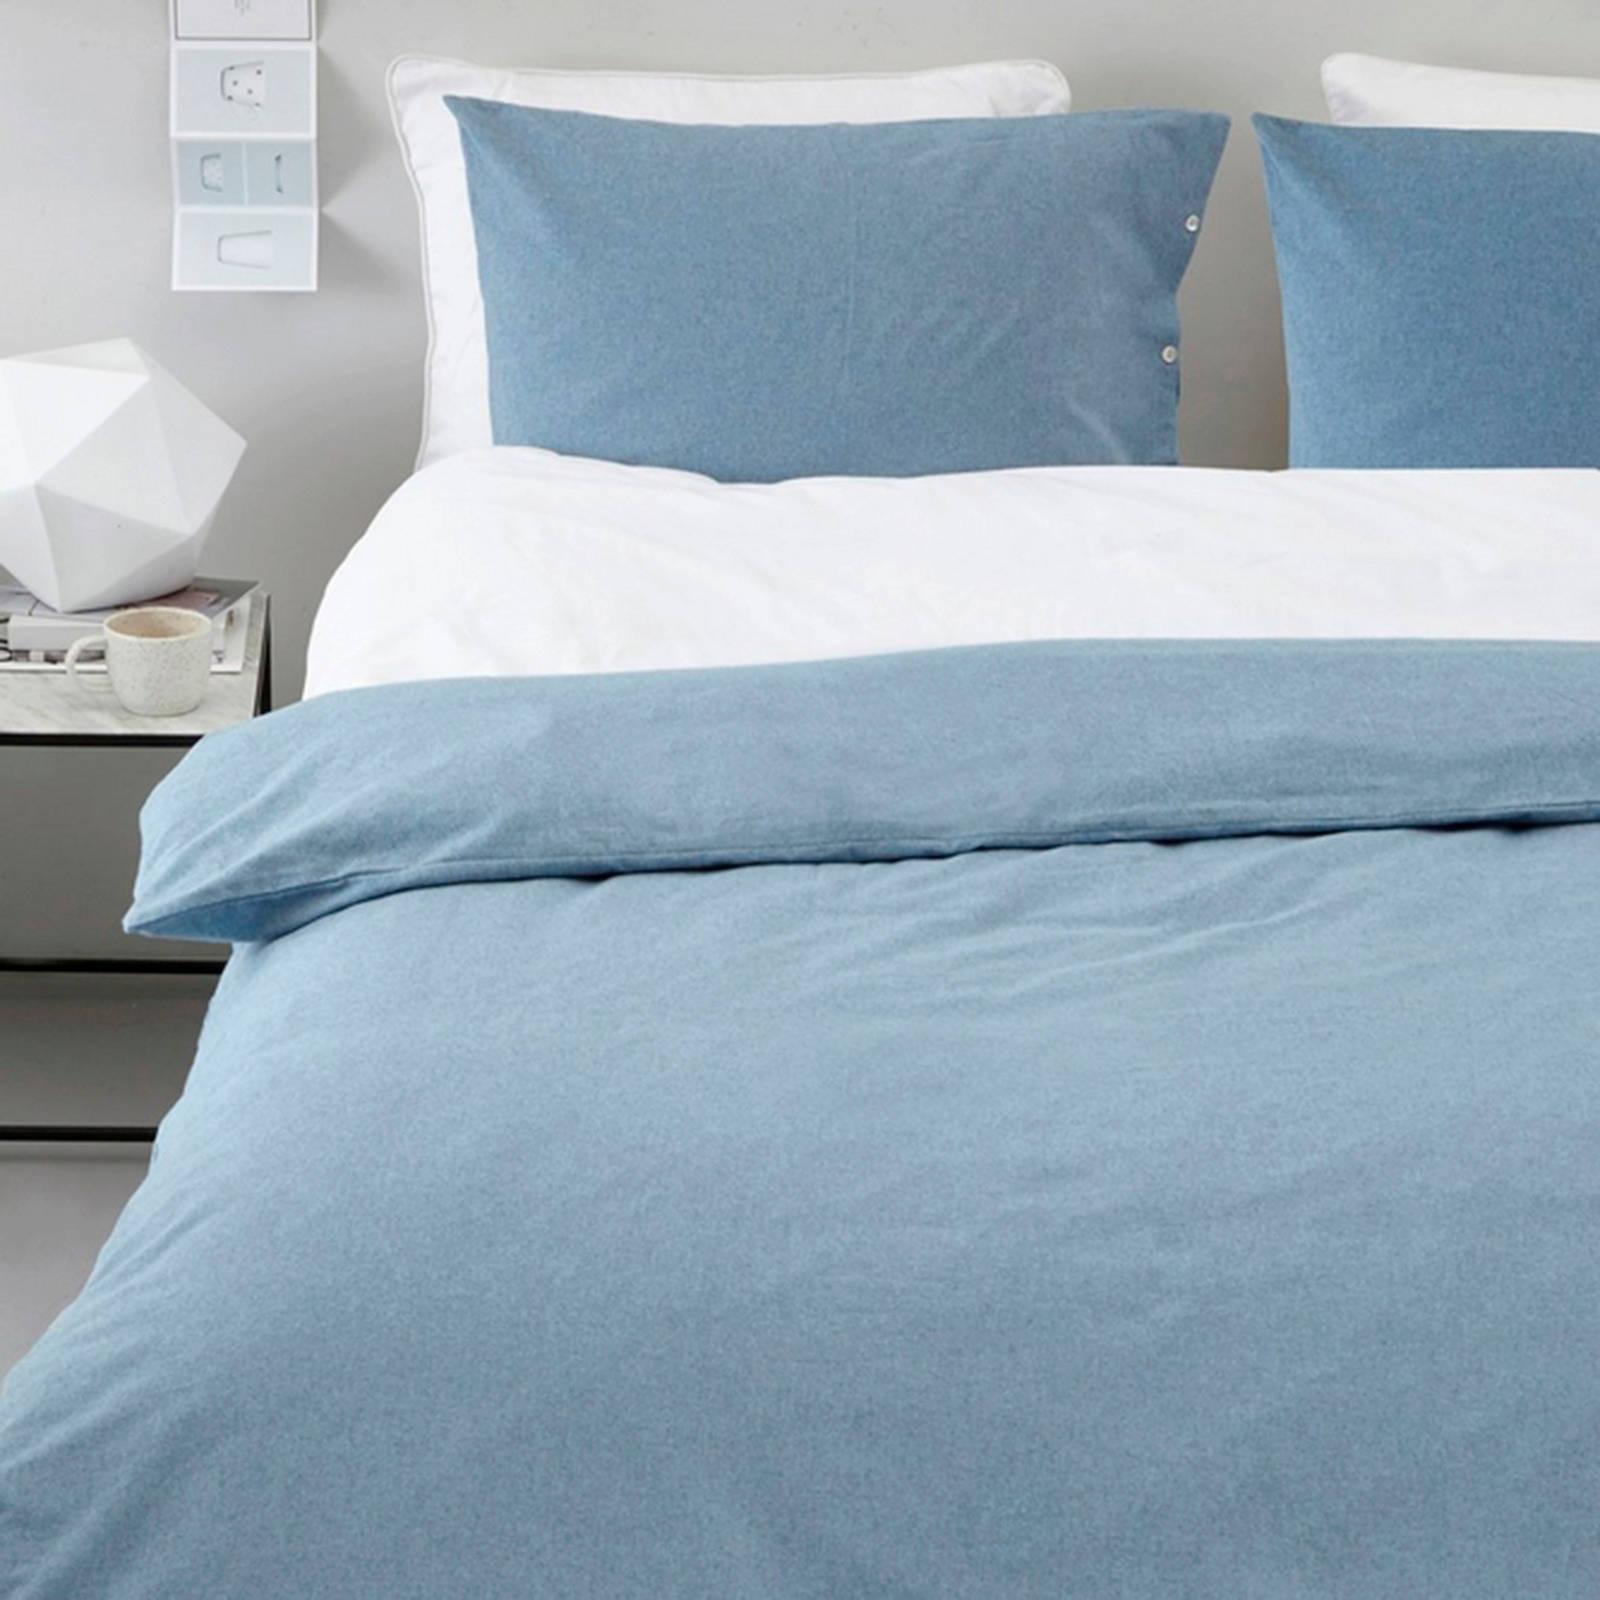 yumeko flanellen dekbedovertrek lits jumeaux blauw